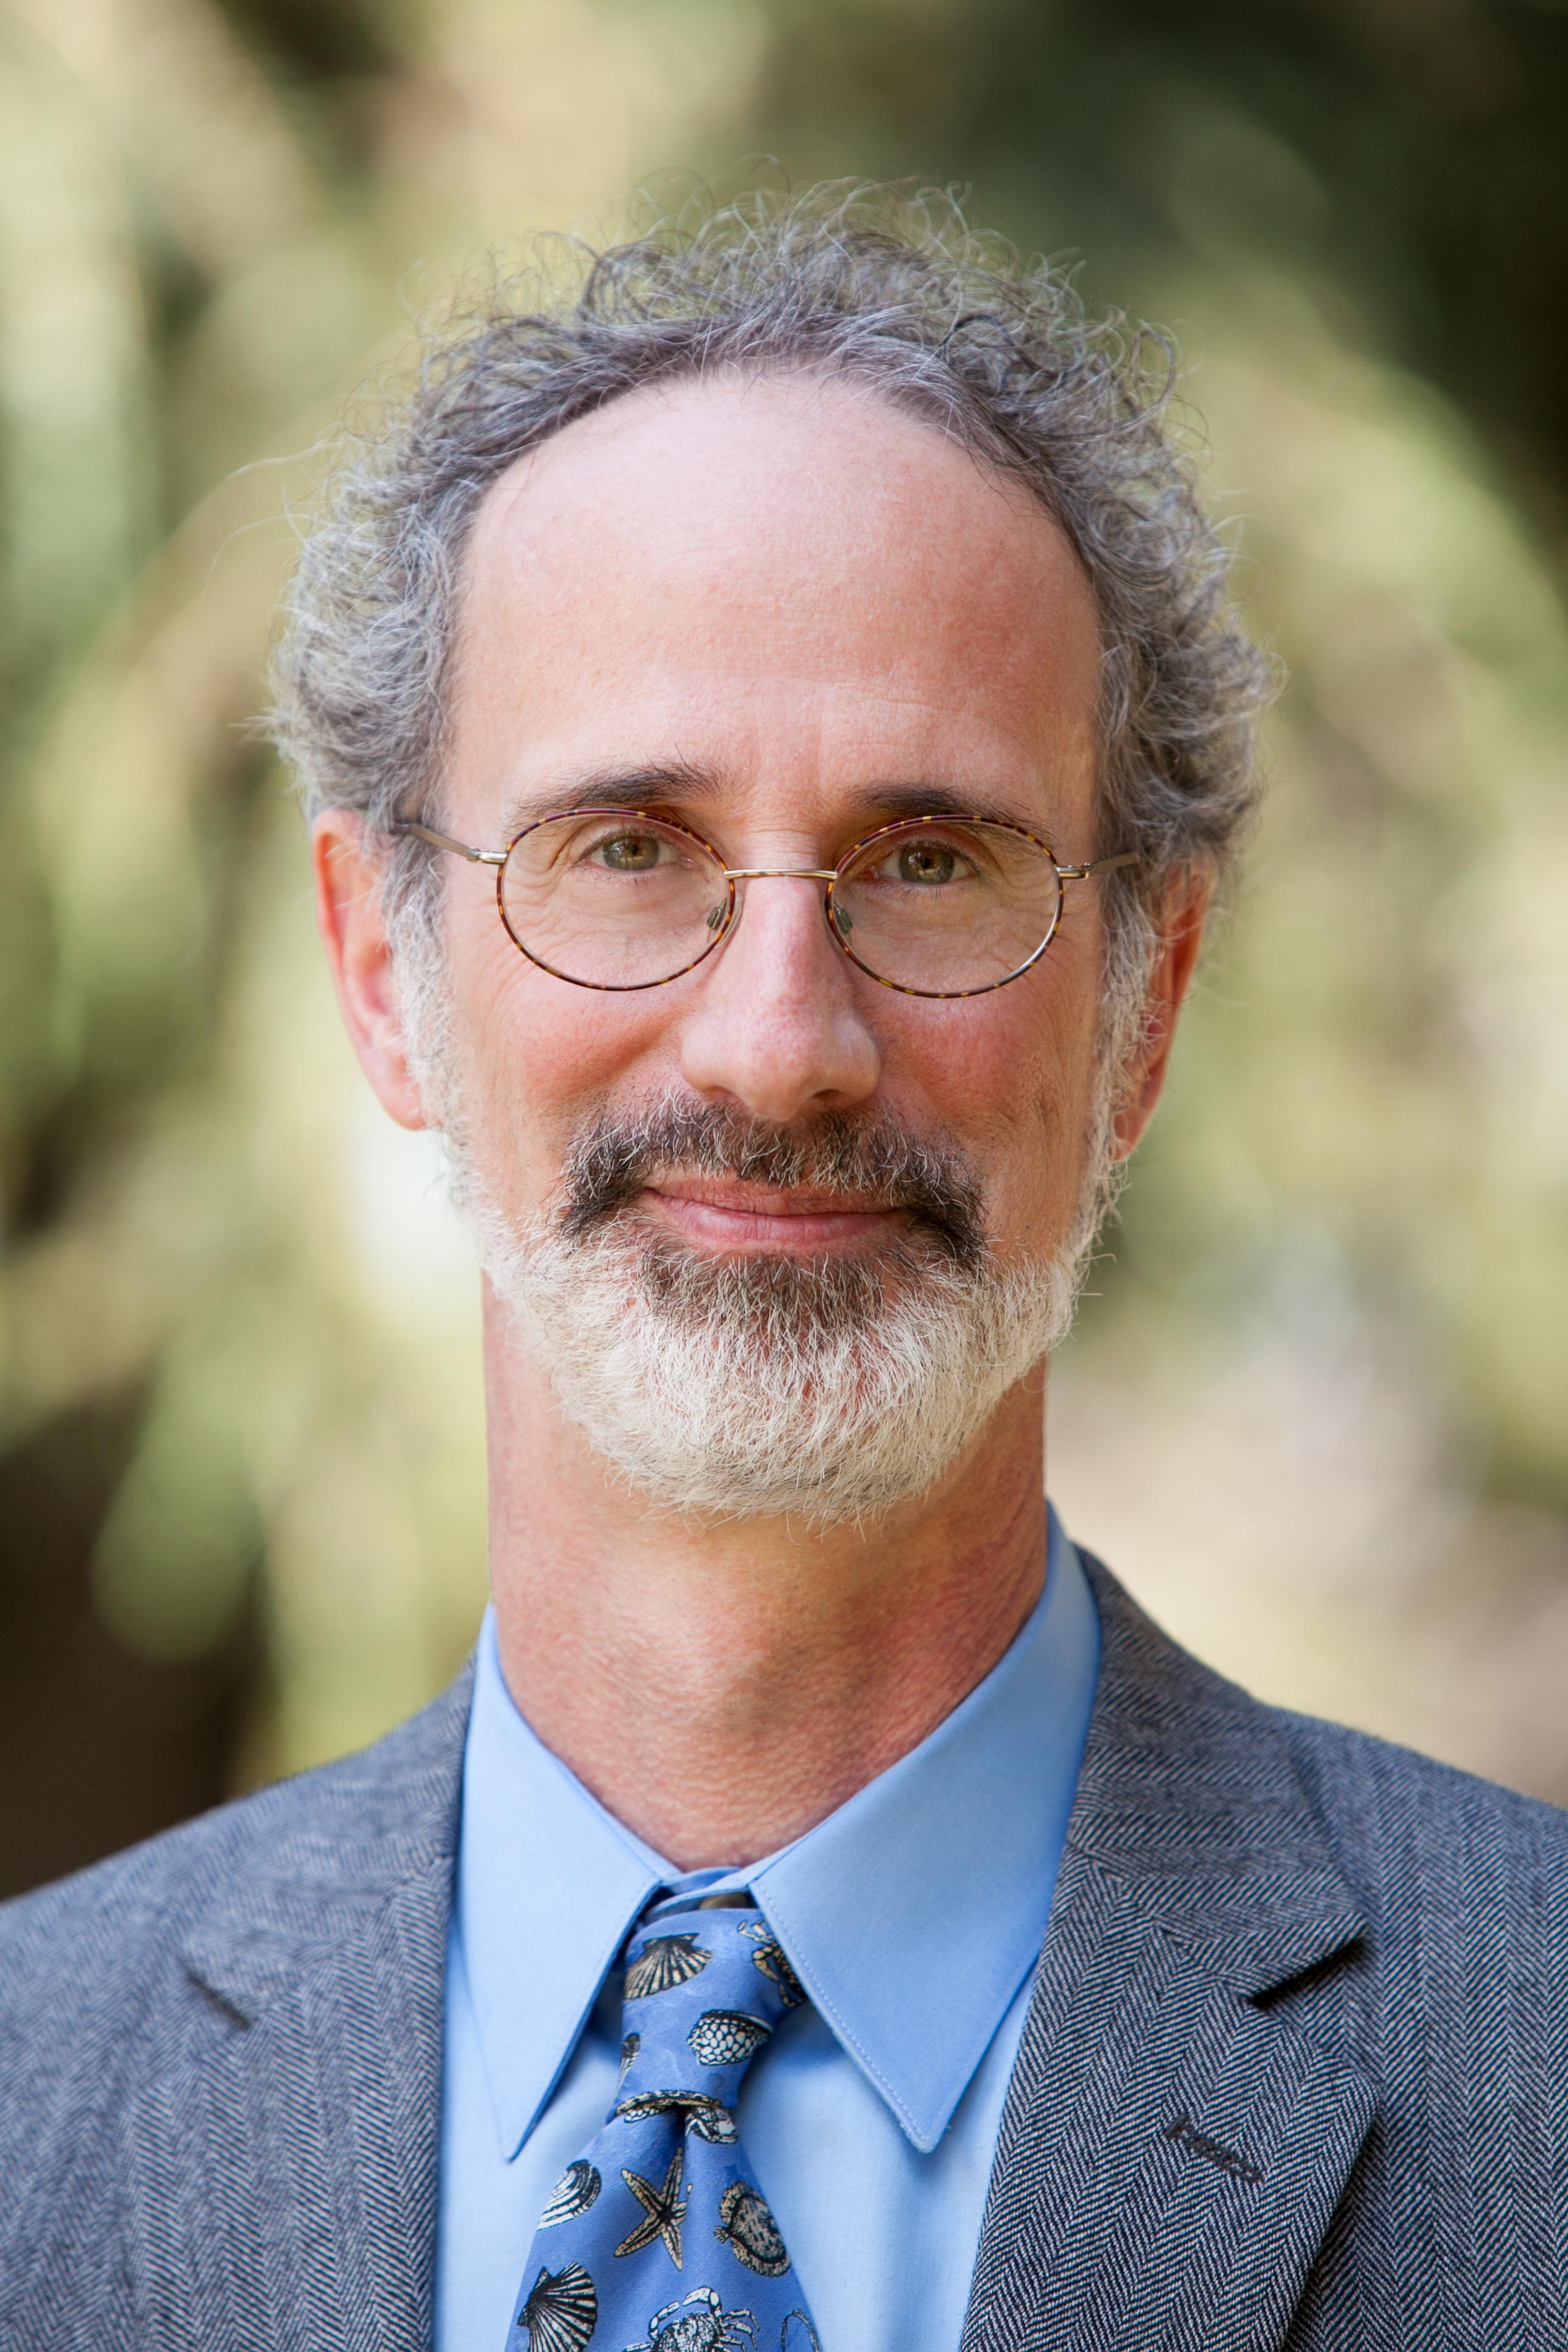 Dr. Peter Gleick, president emeritus of the Pacific Institute